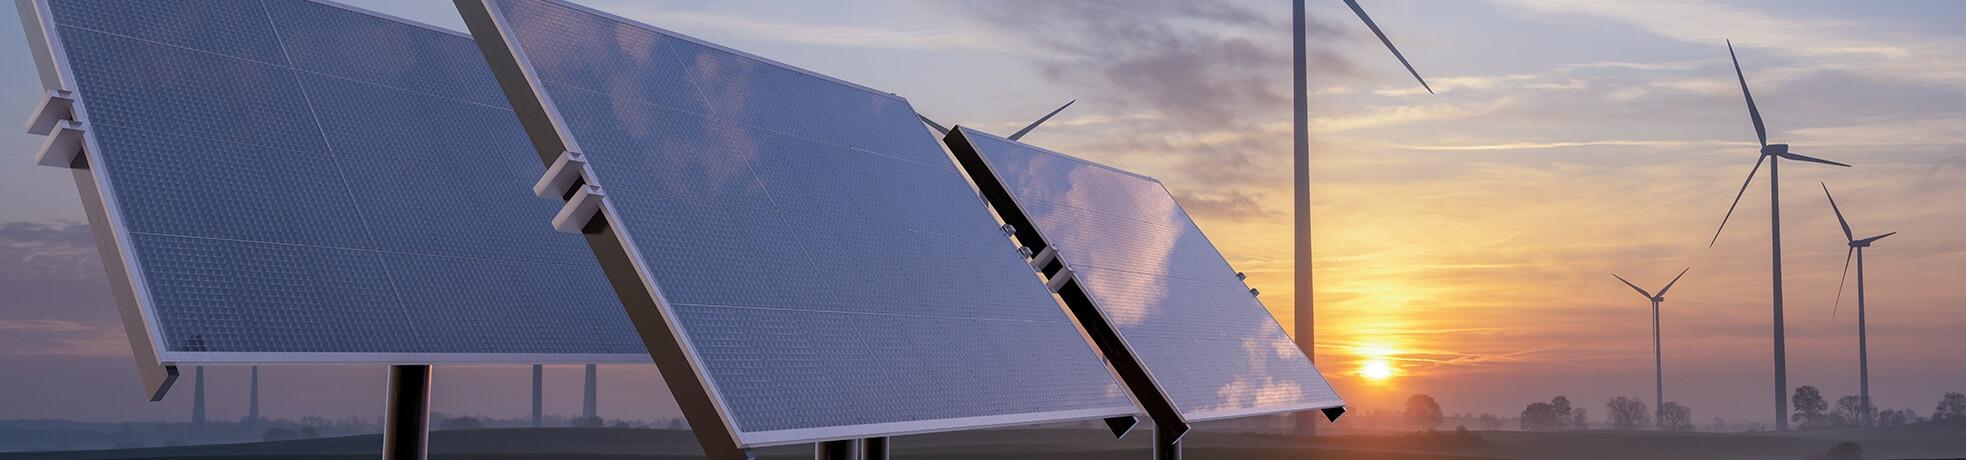 A fossil fuel free future